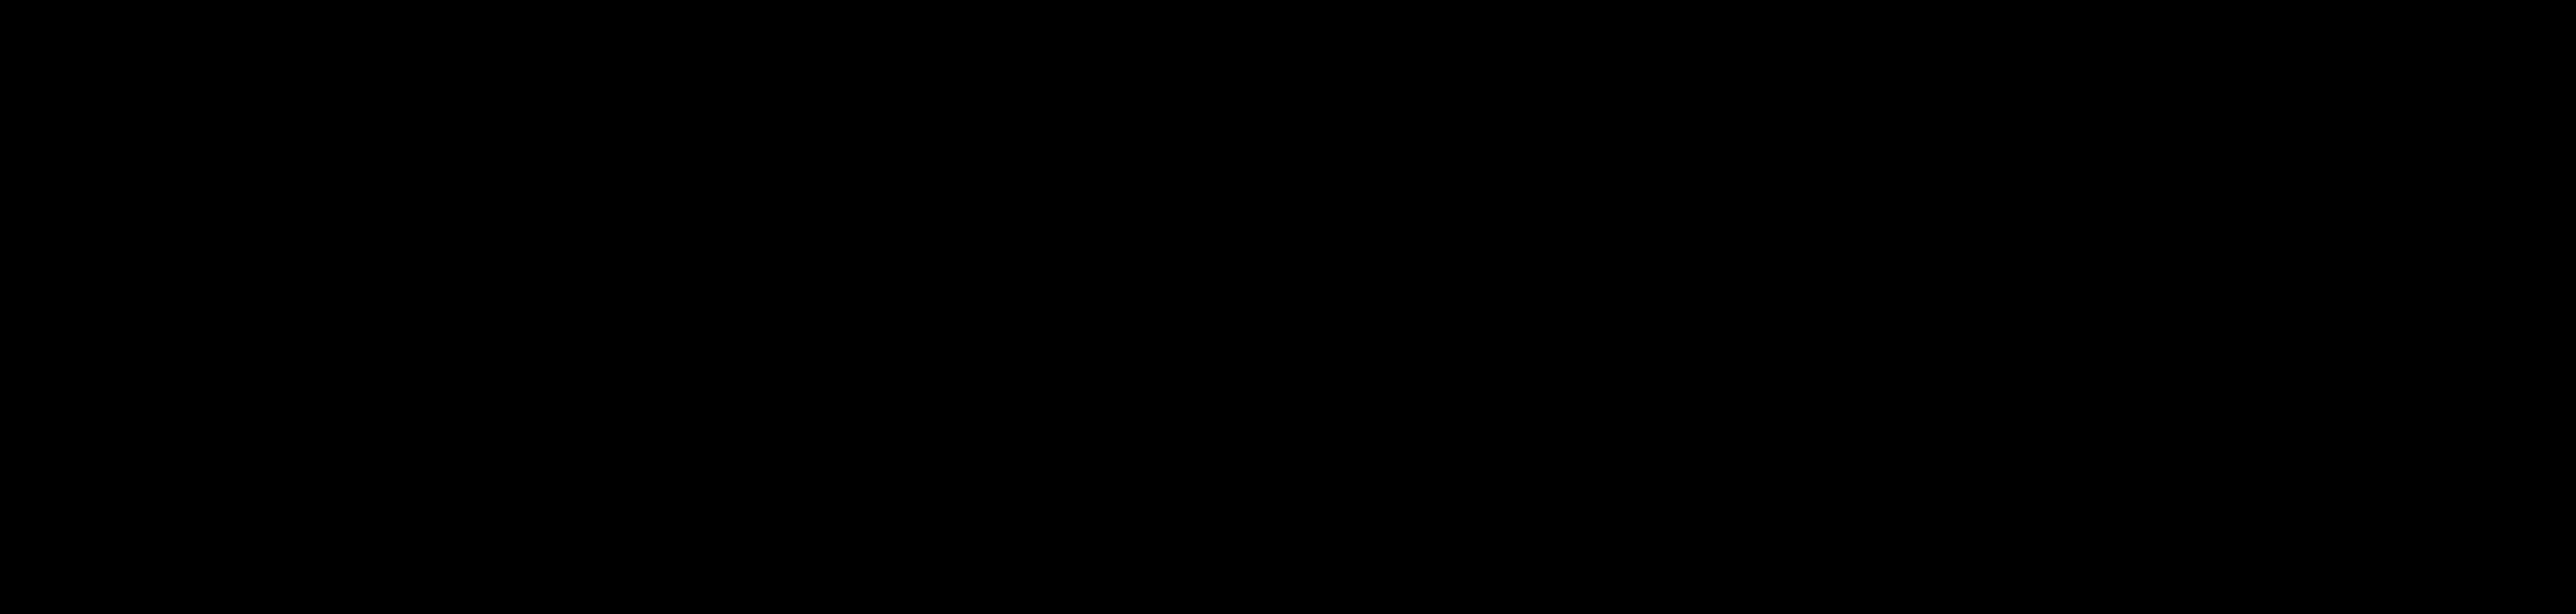 AMD-1.png